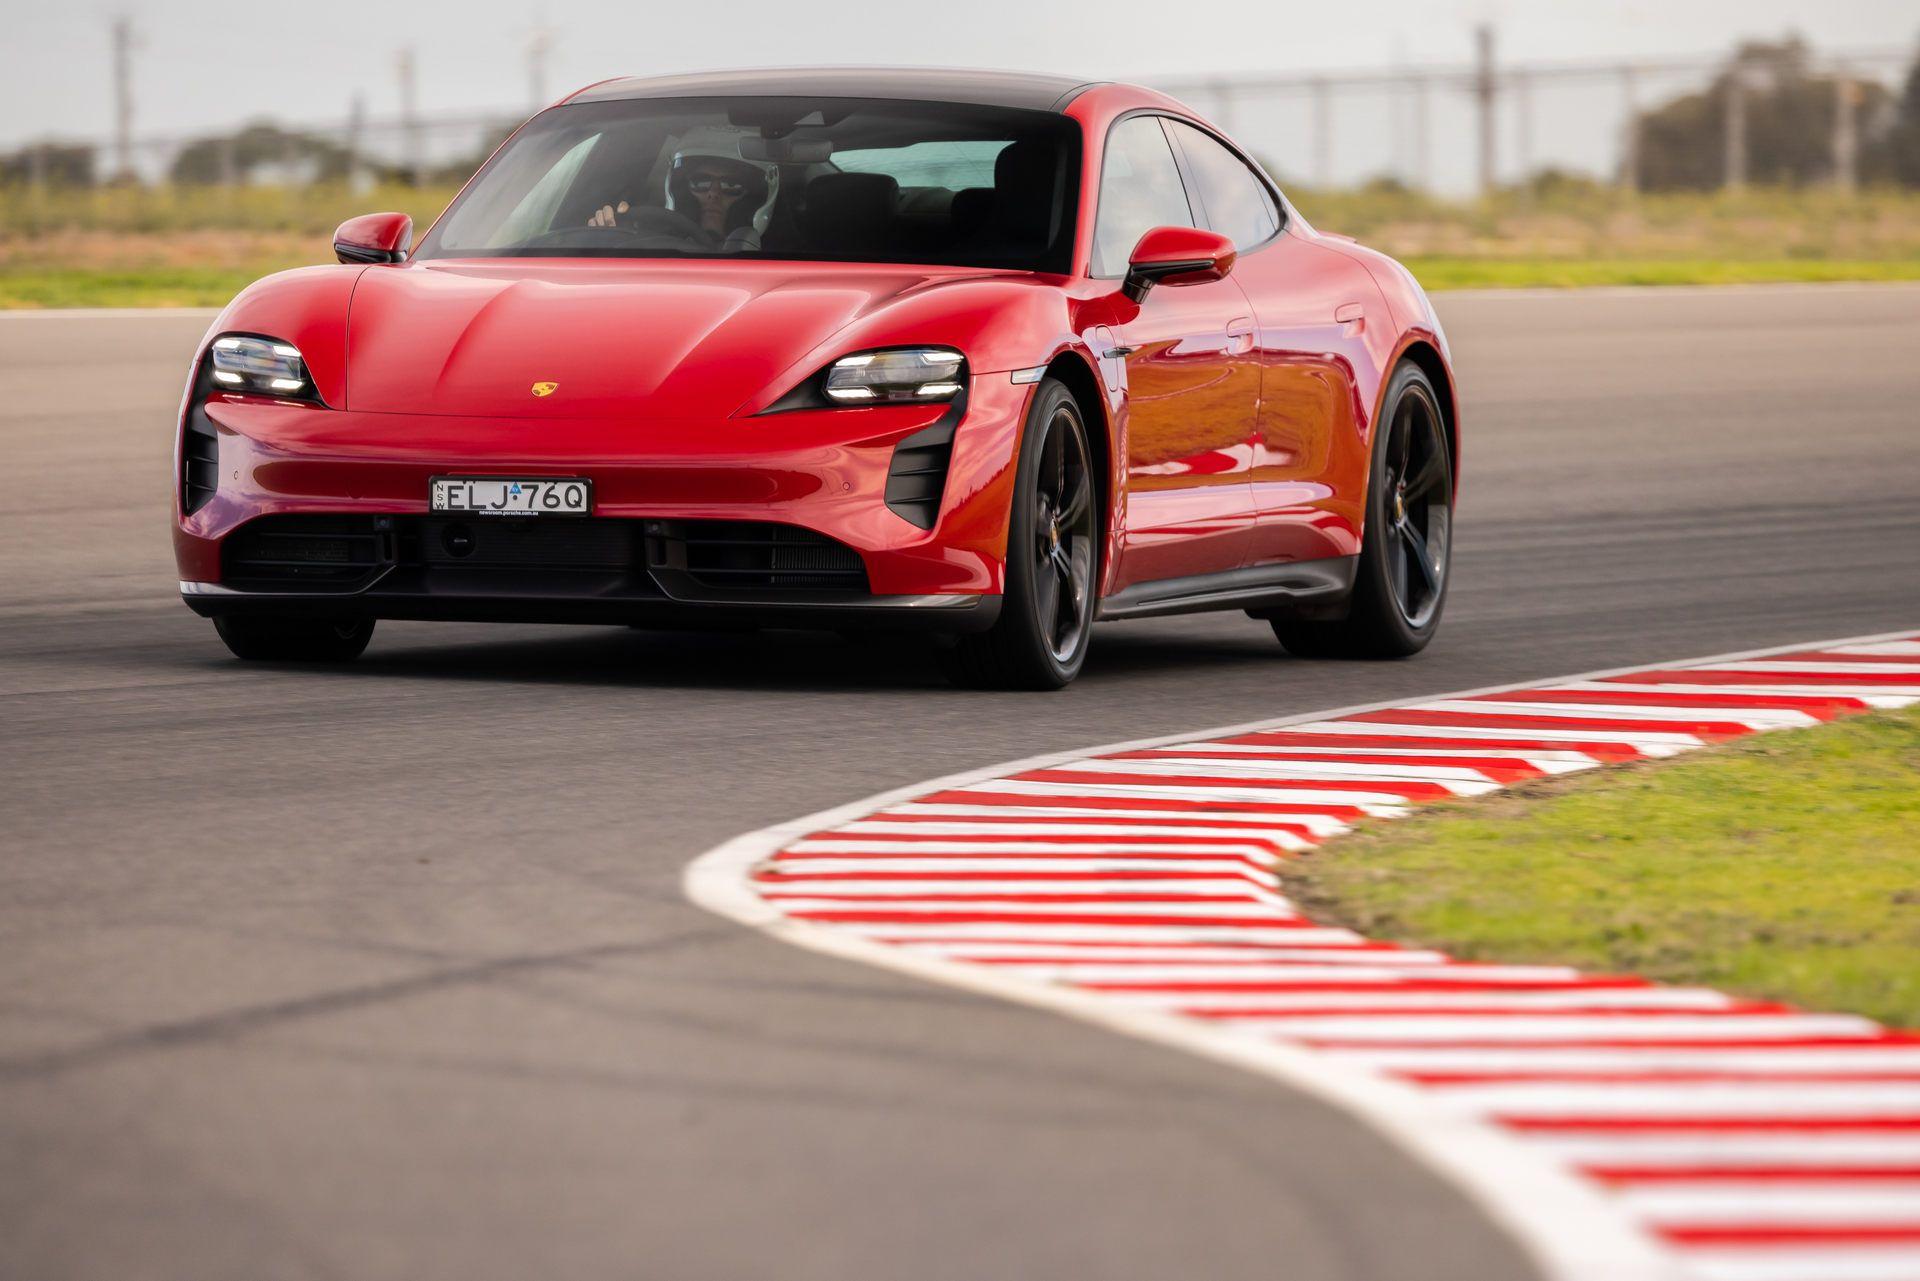 Porsche-Taycan-Turbo-S-The-Bend-Motorsport-Park-4